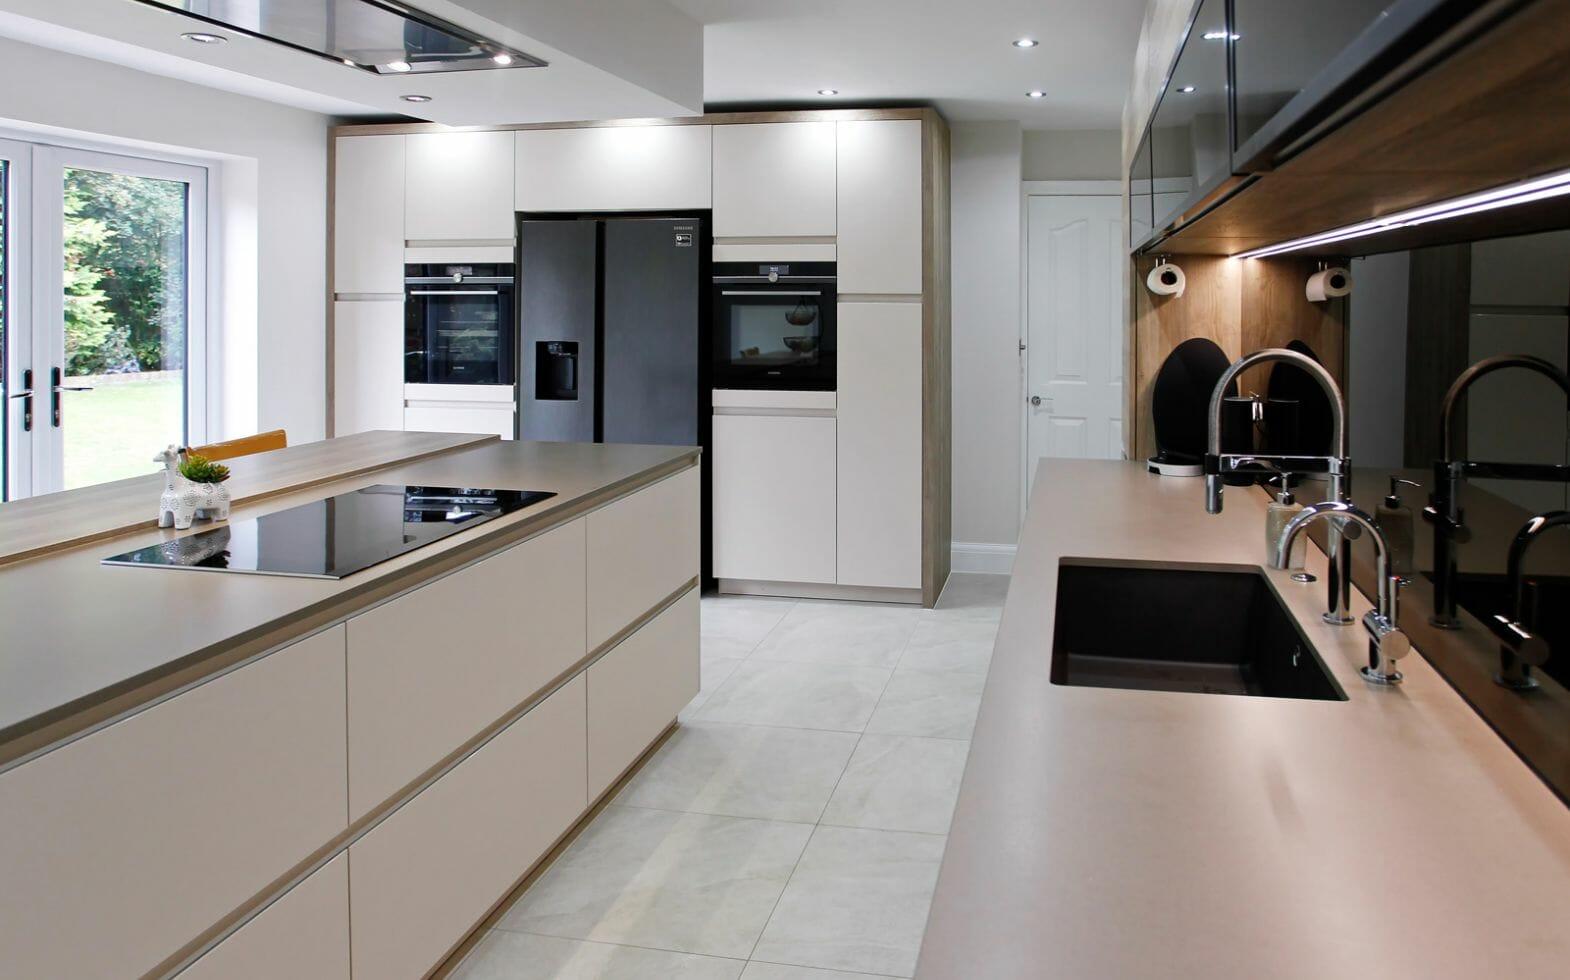 Kitchen example 5